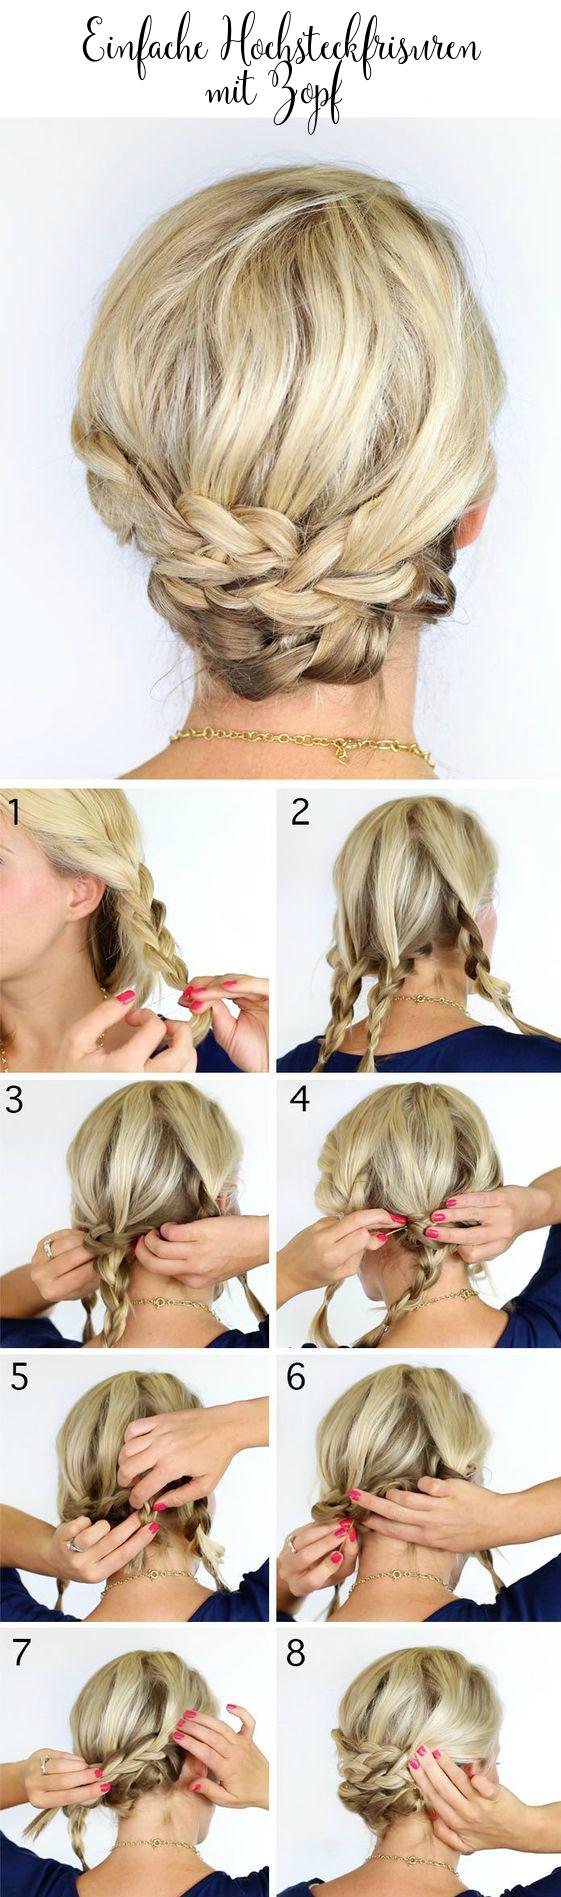 Schulterlange Haare Flechten 15 Kinderleichte Anleitungen Fur